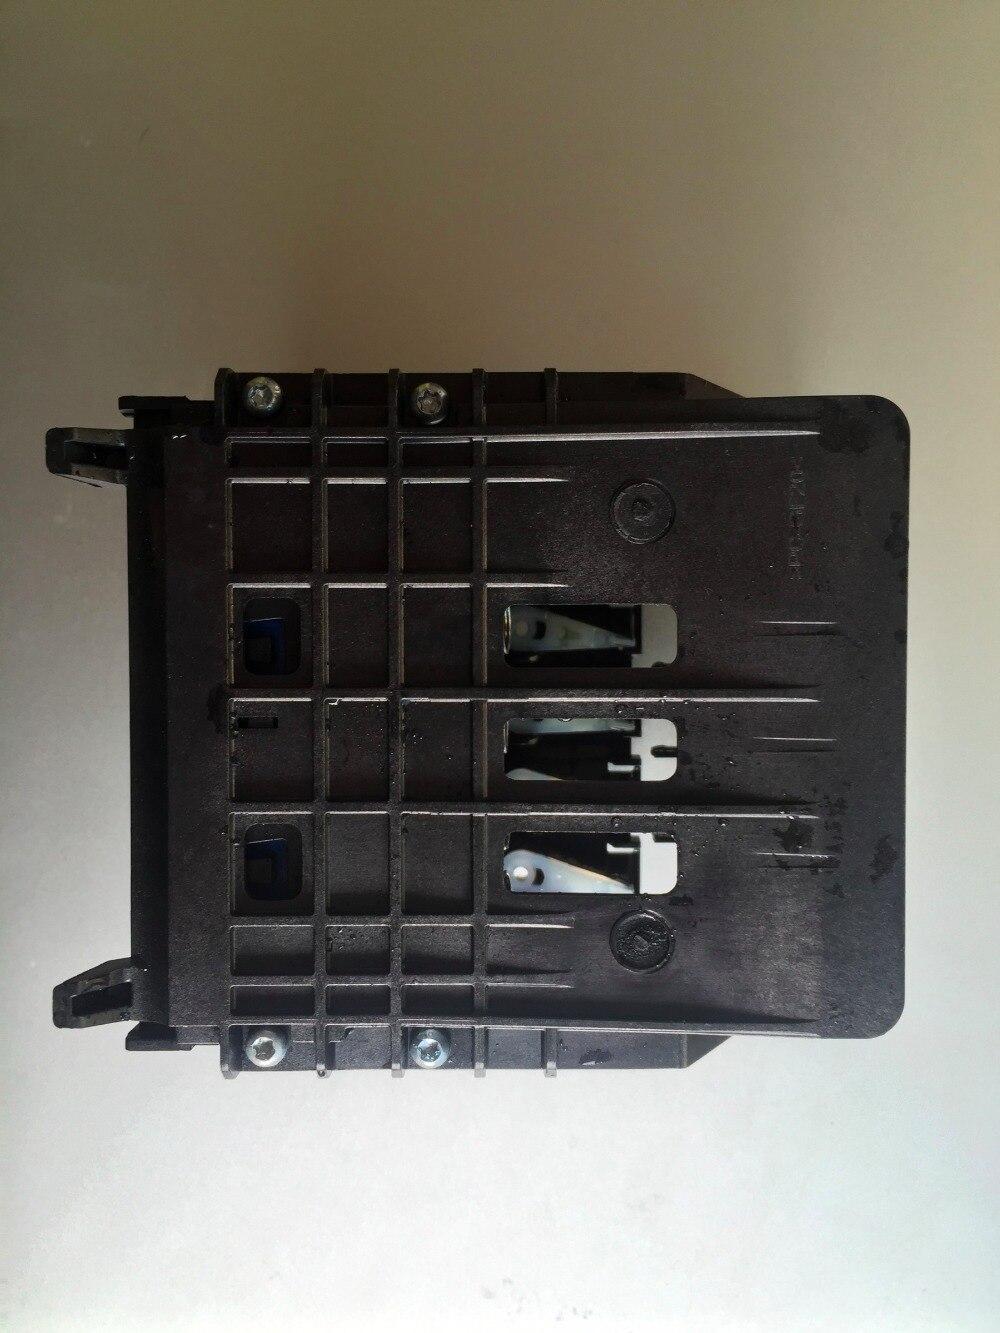 Reman  CM751-80013A Printhead Duplexer for HP Pro 8100 8600 950 951